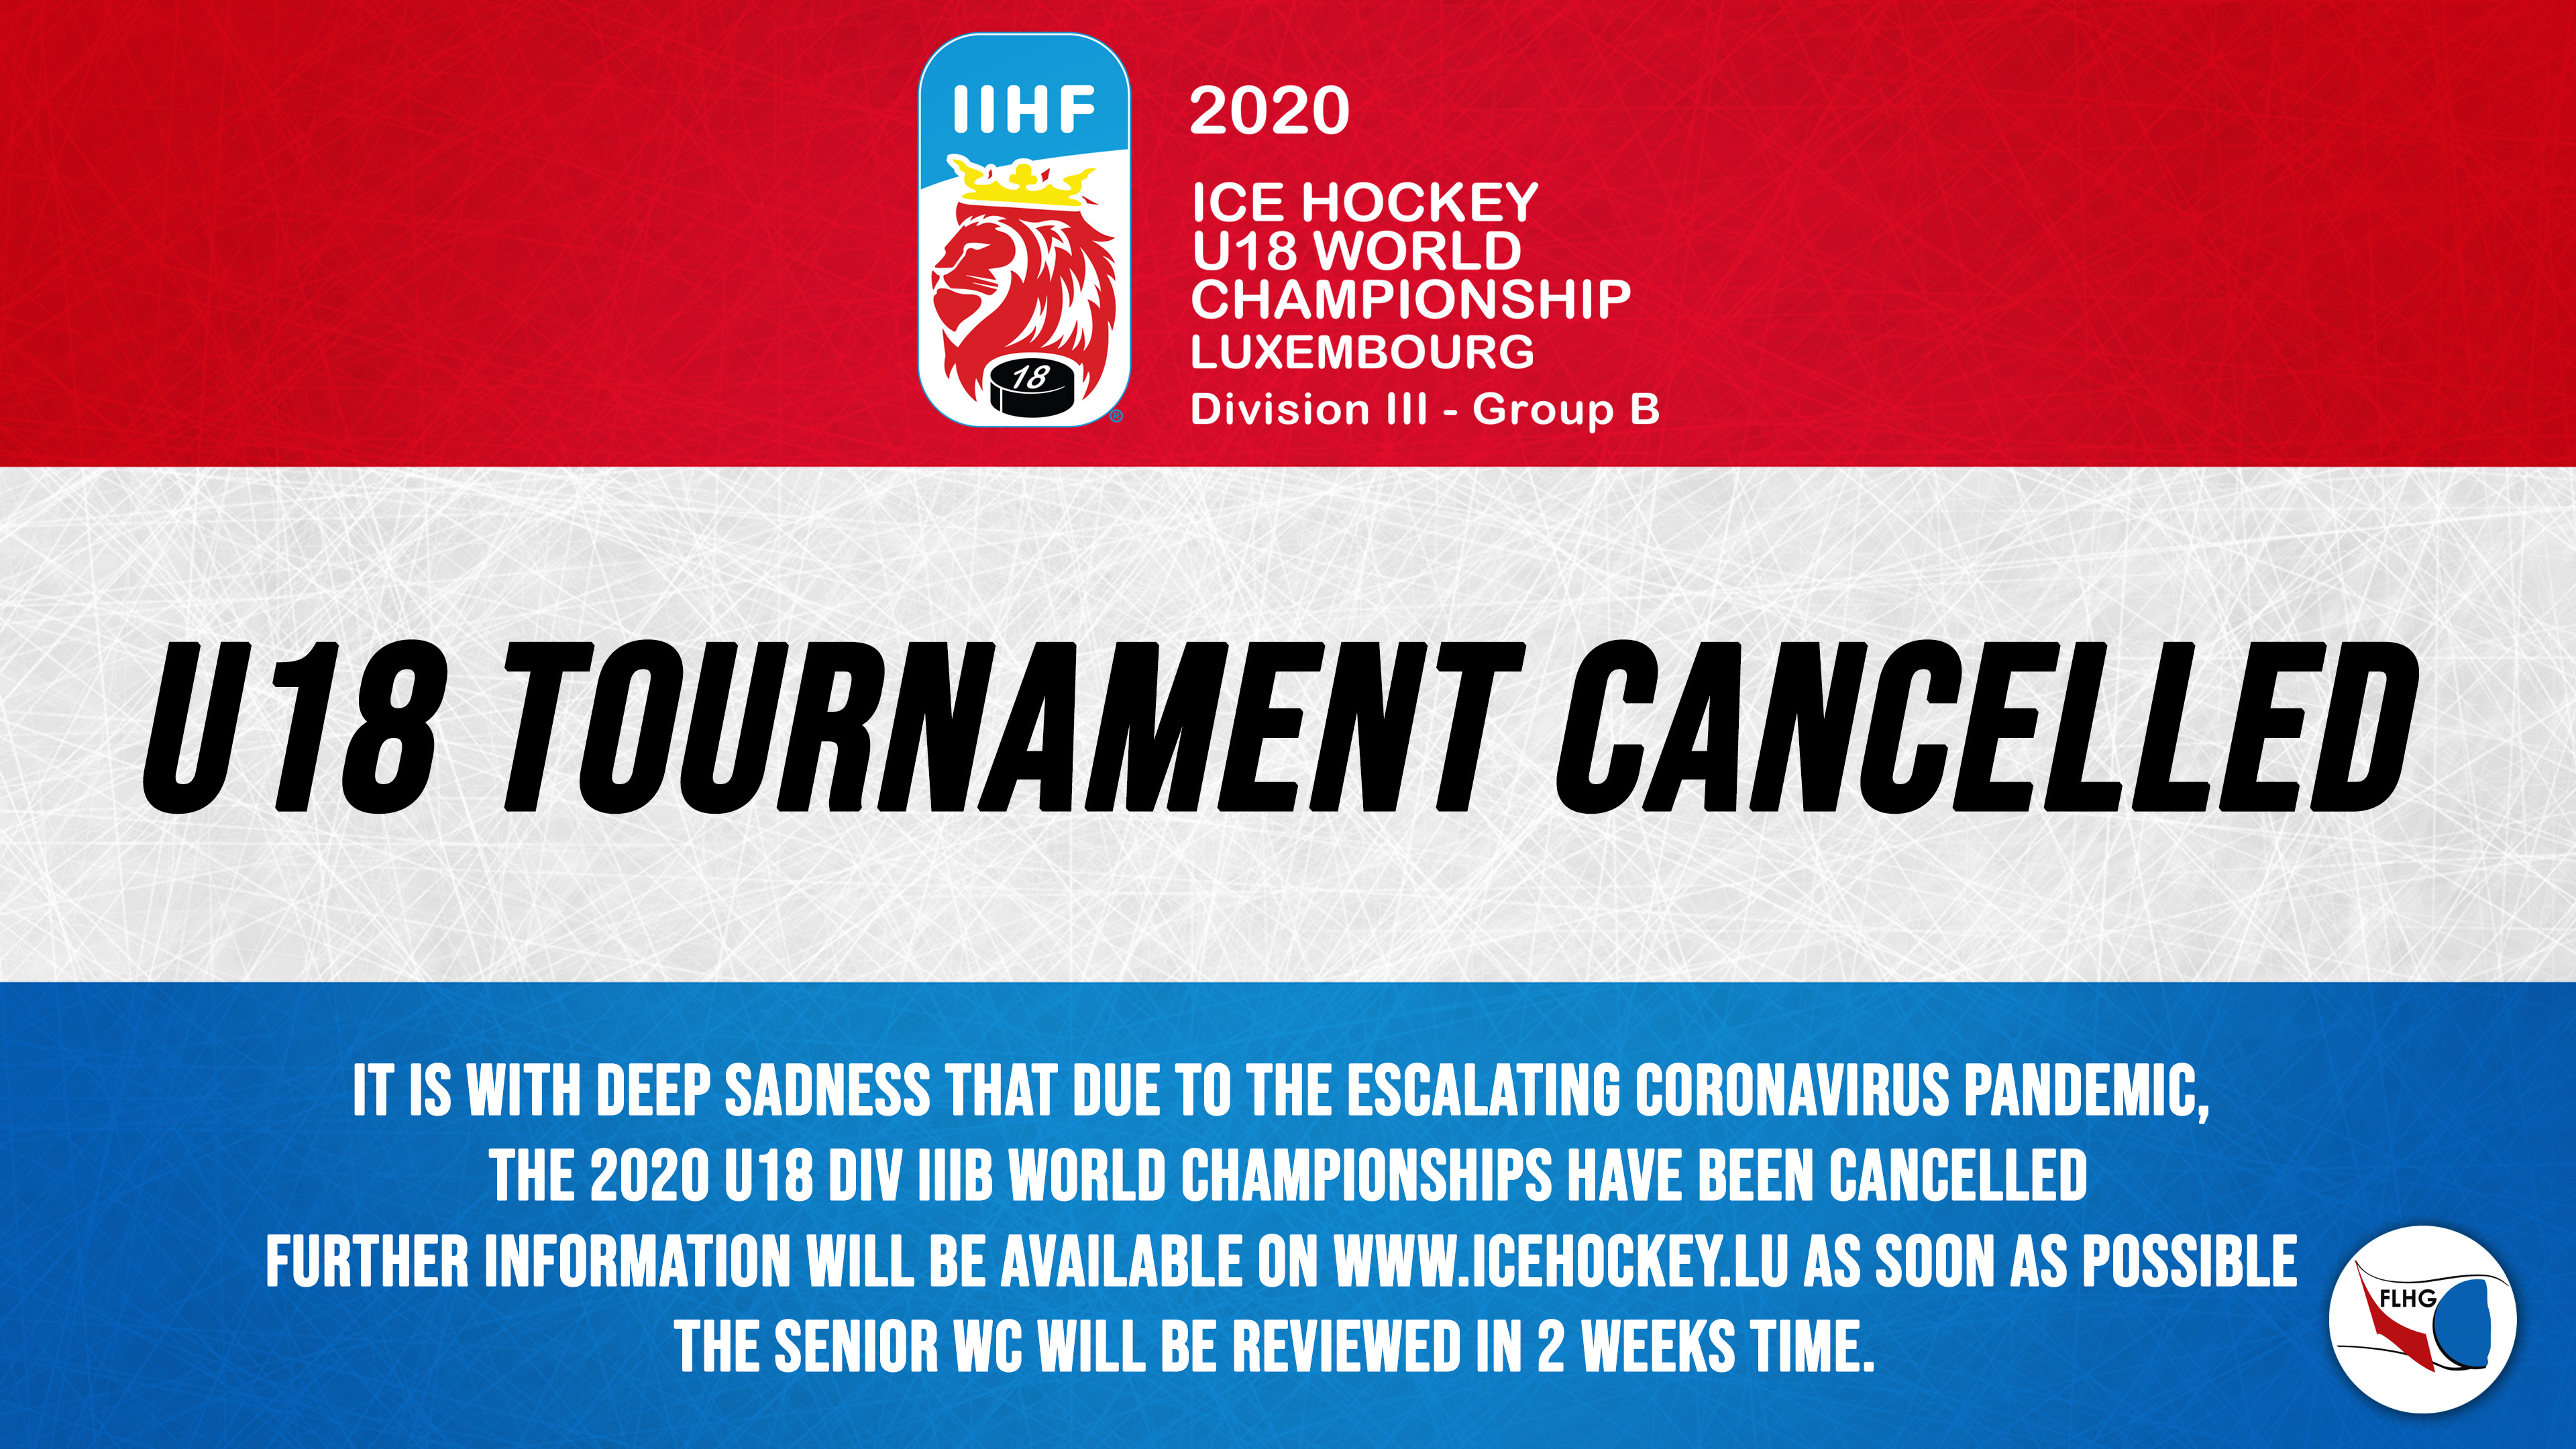 2020 U18 World Championships cancelled / championnats du monde U18 annulé